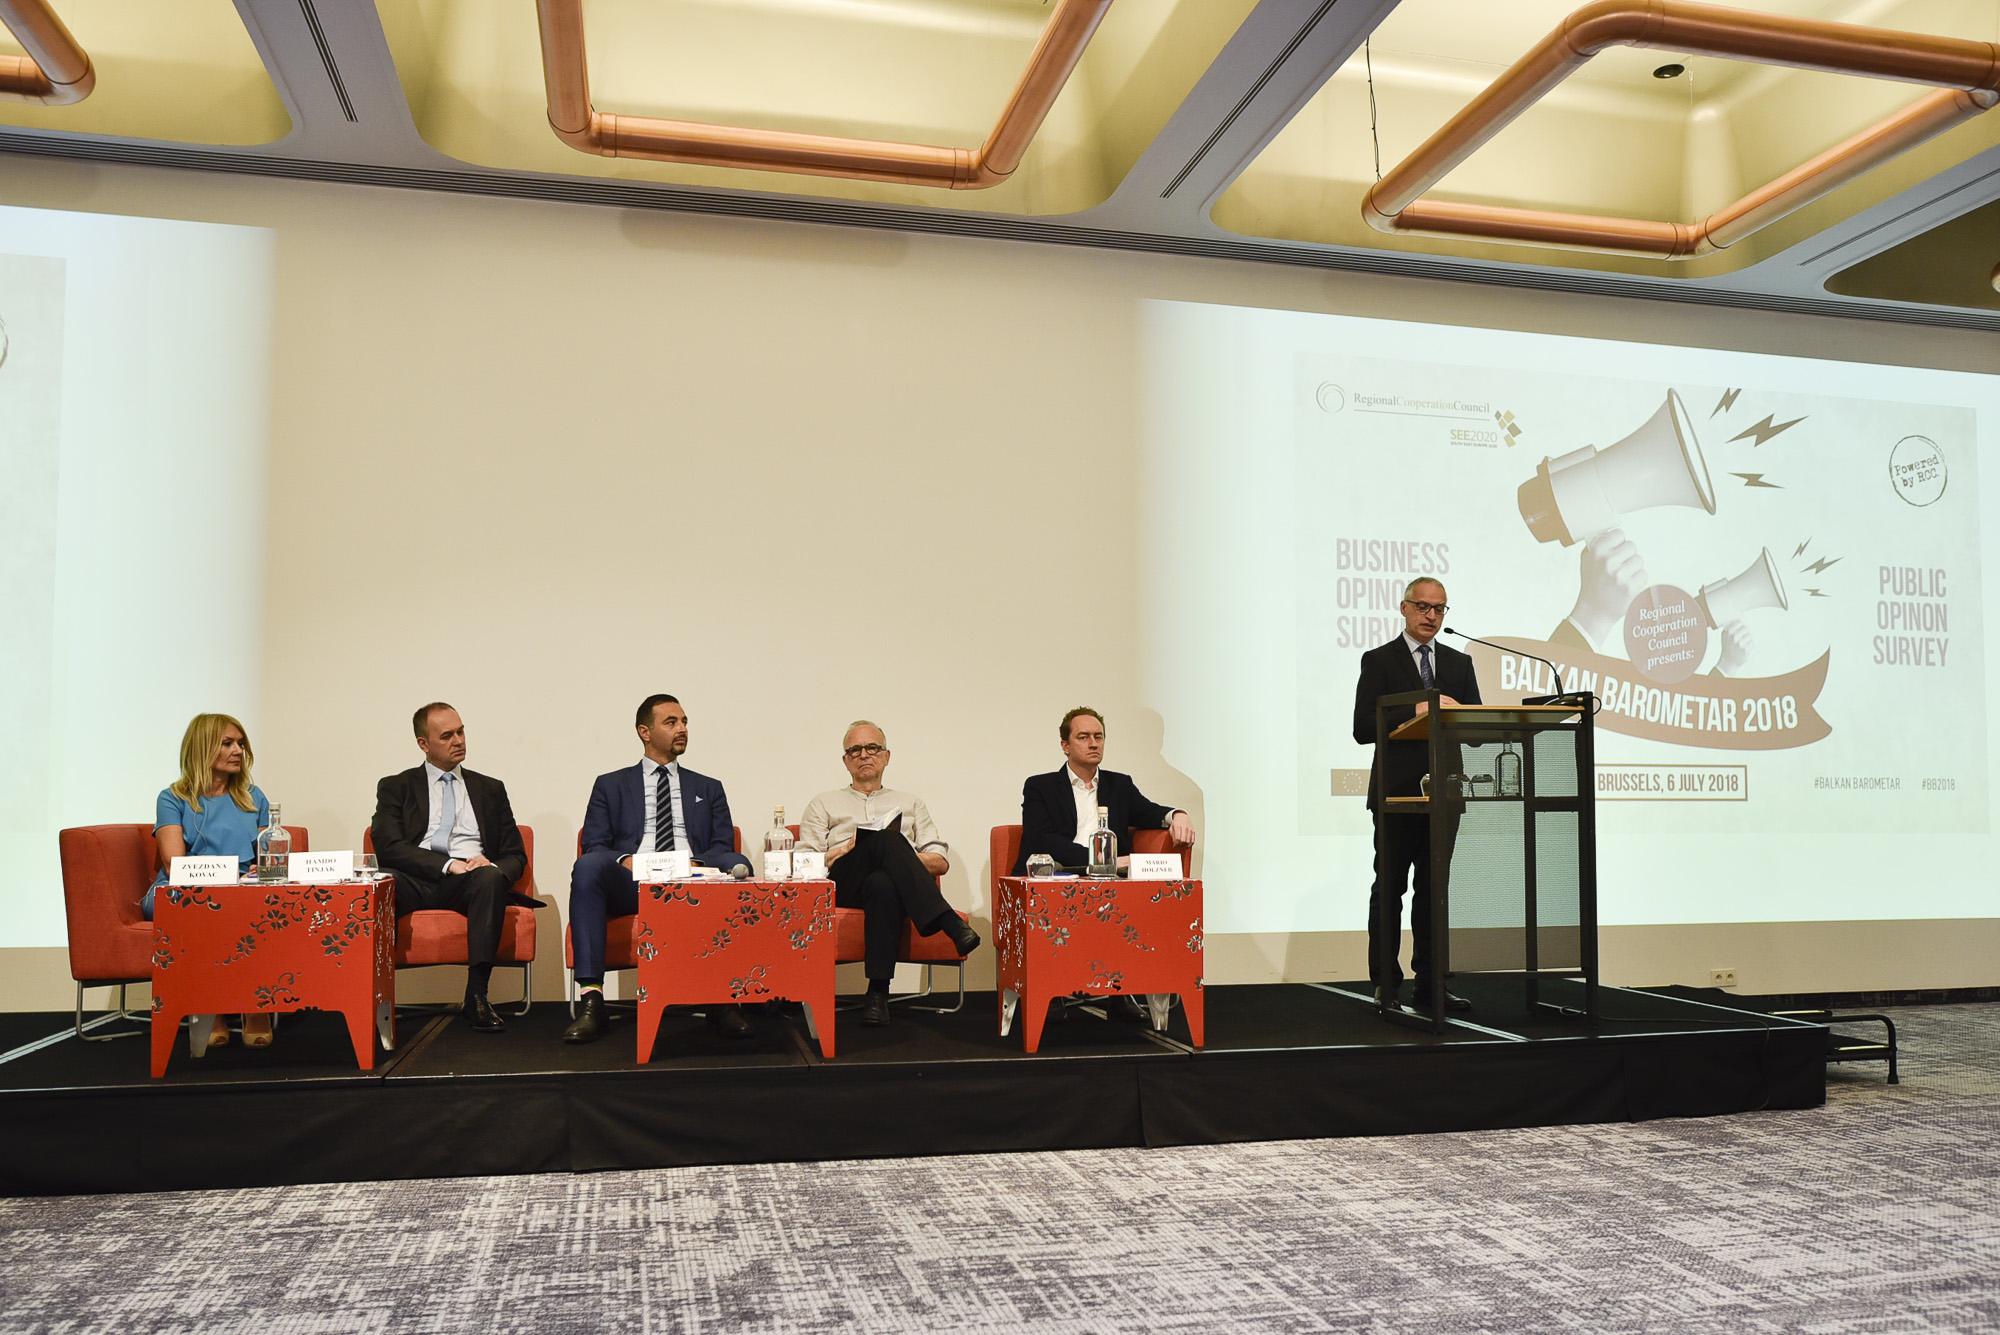 Goran Svilanovic, Secretary General of the Regional Cooperation Council (RCC) presents Balkan Barometer 2018, in Brussels, 6 July 2018 (Photo: RCC/Jerome Hubert)